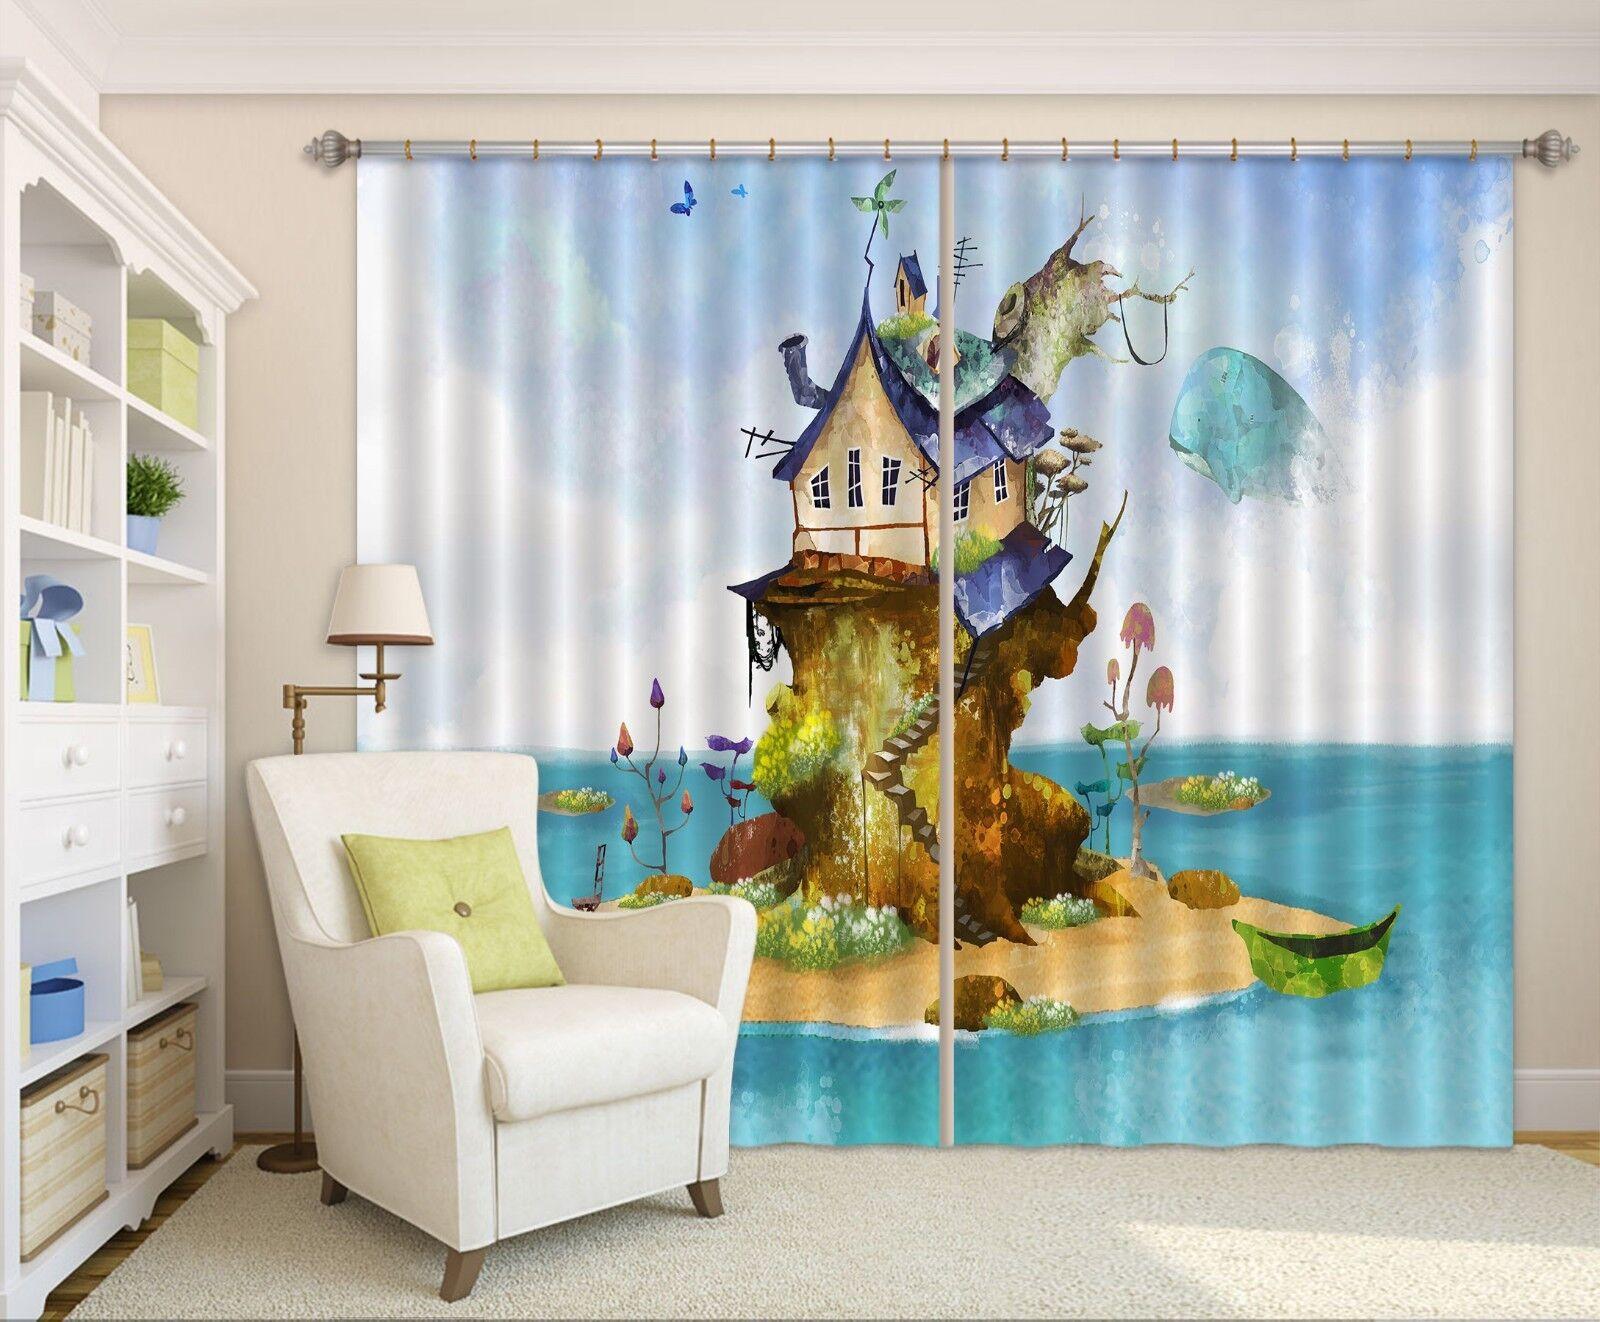 3D casa Mar 75 Cortinas de impresión de cortina de foto Blockout Tela Cortinas Ventana au